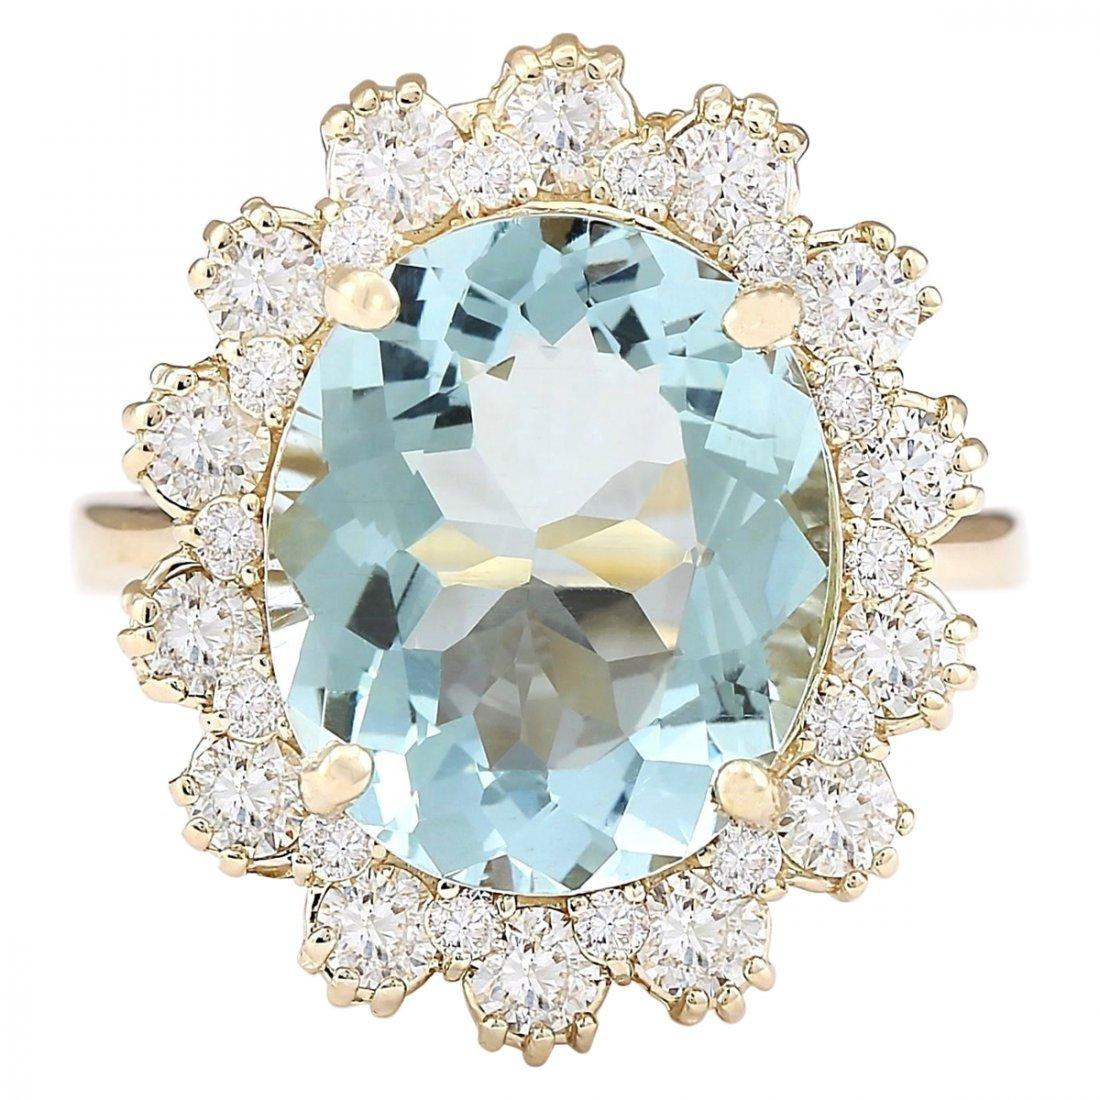 6.73 CTW Natural Blue Aquamarine And Diamond Ring In